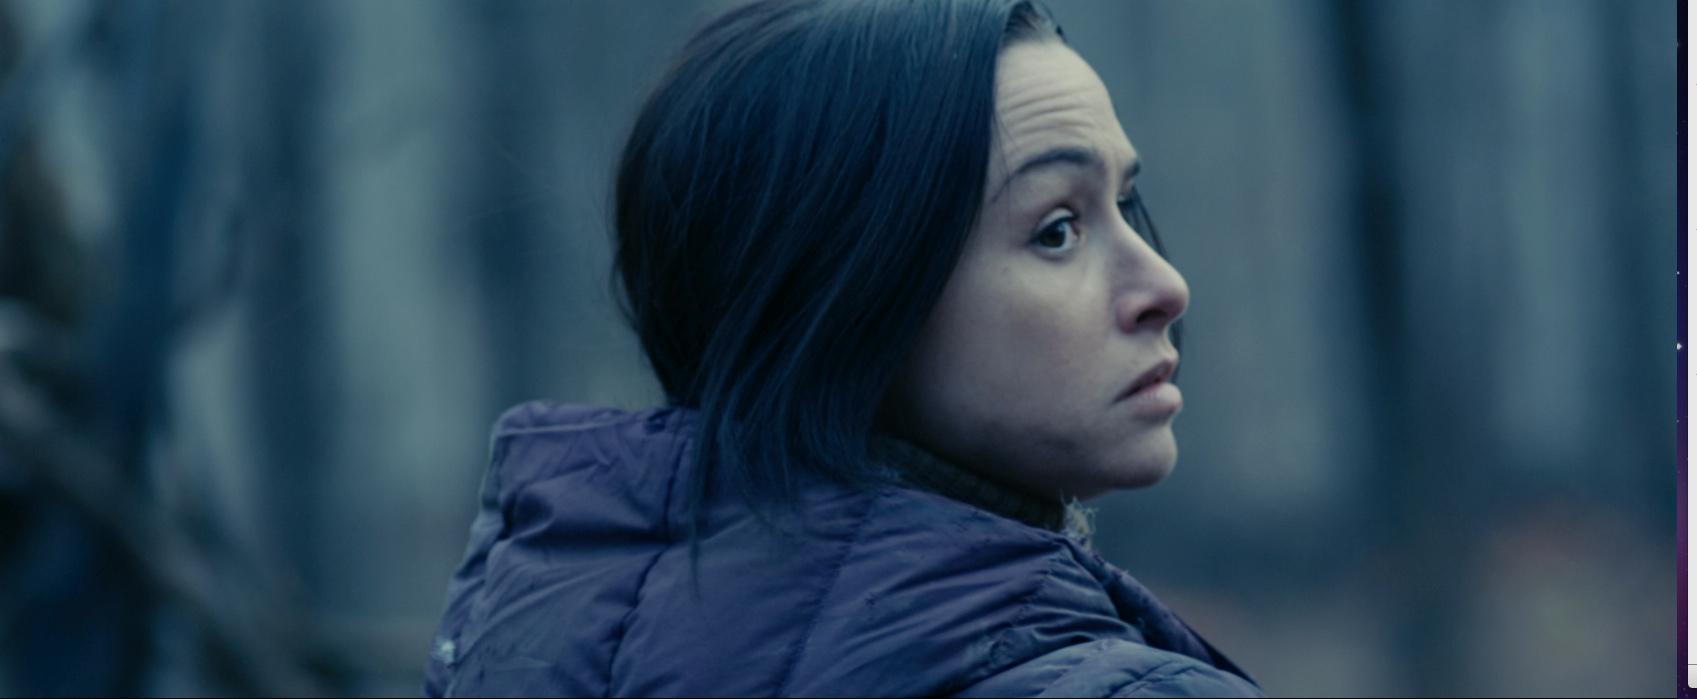 Danielle Harris in Stake Land (2010)